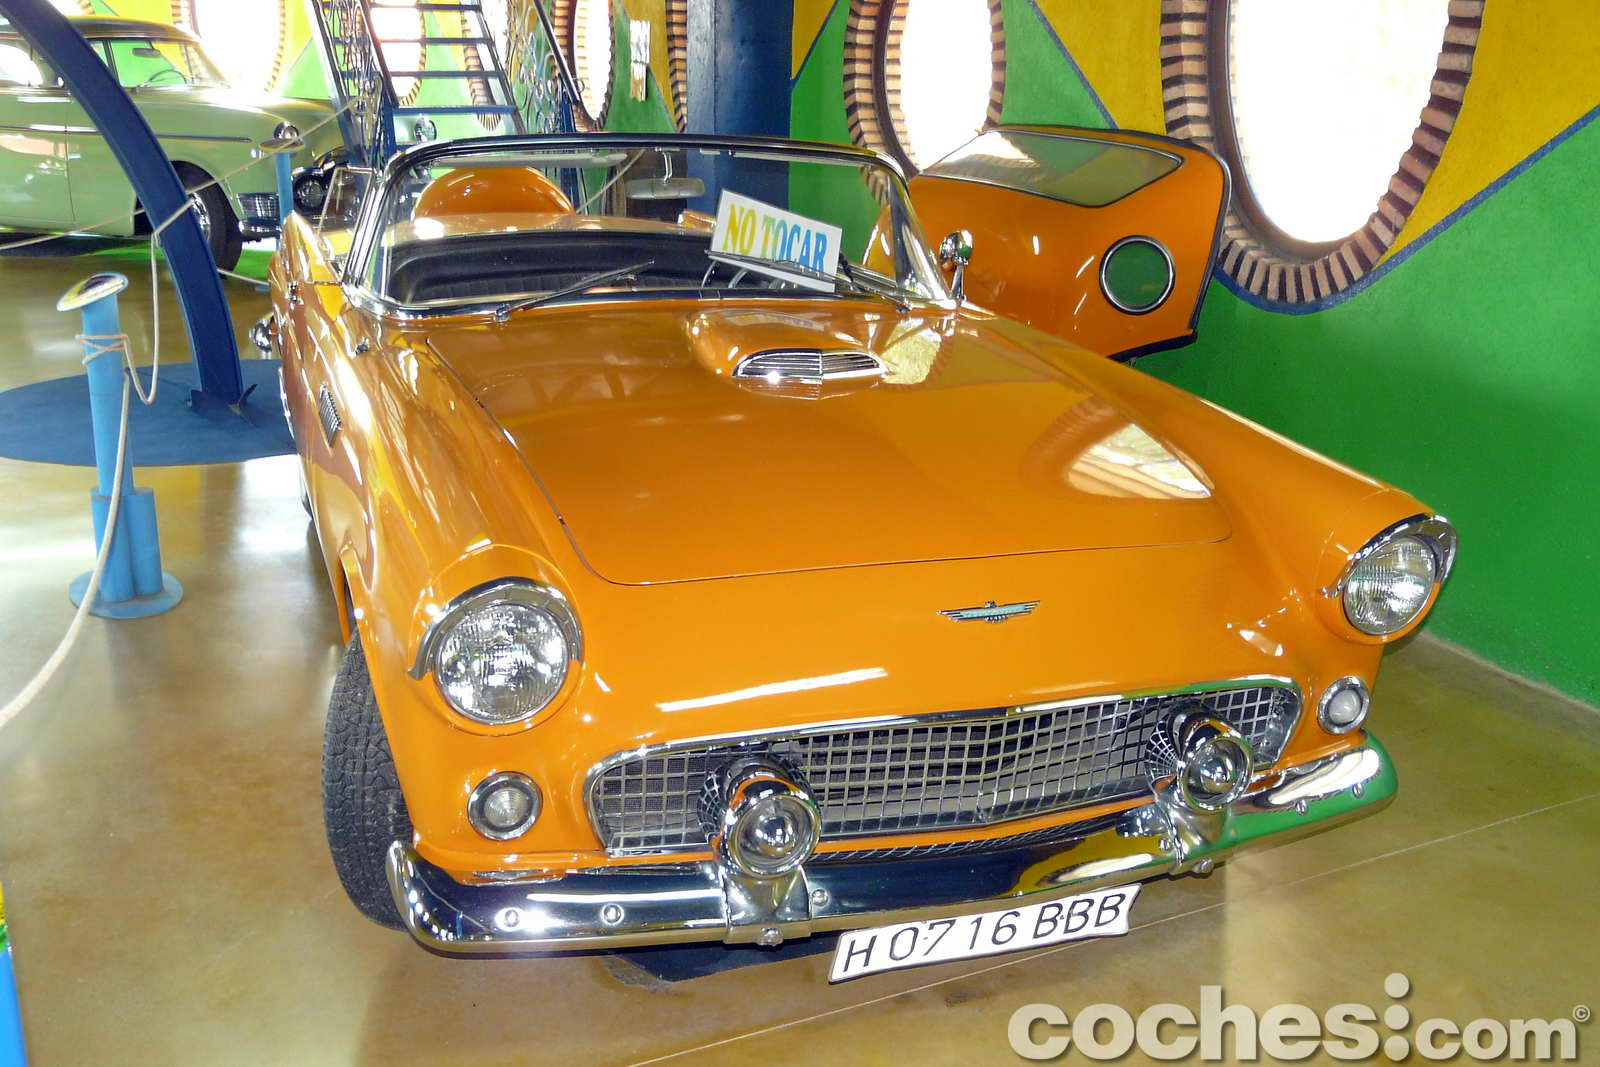 Museo_Moto_Coches_Clasicos_Hervas_03